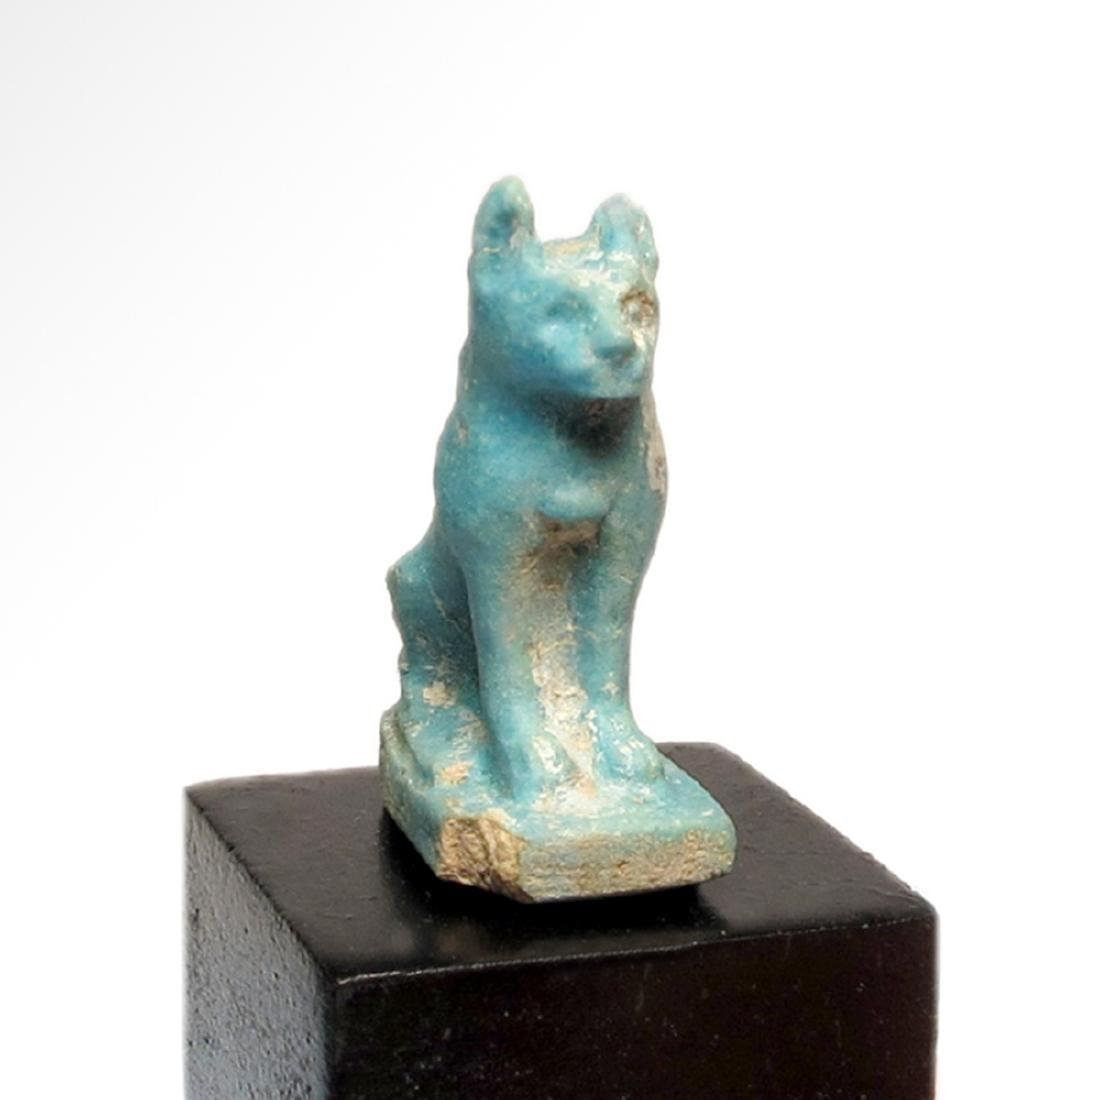 Egyptian Faience Cat Amulet, c. 900 B.C. - 4